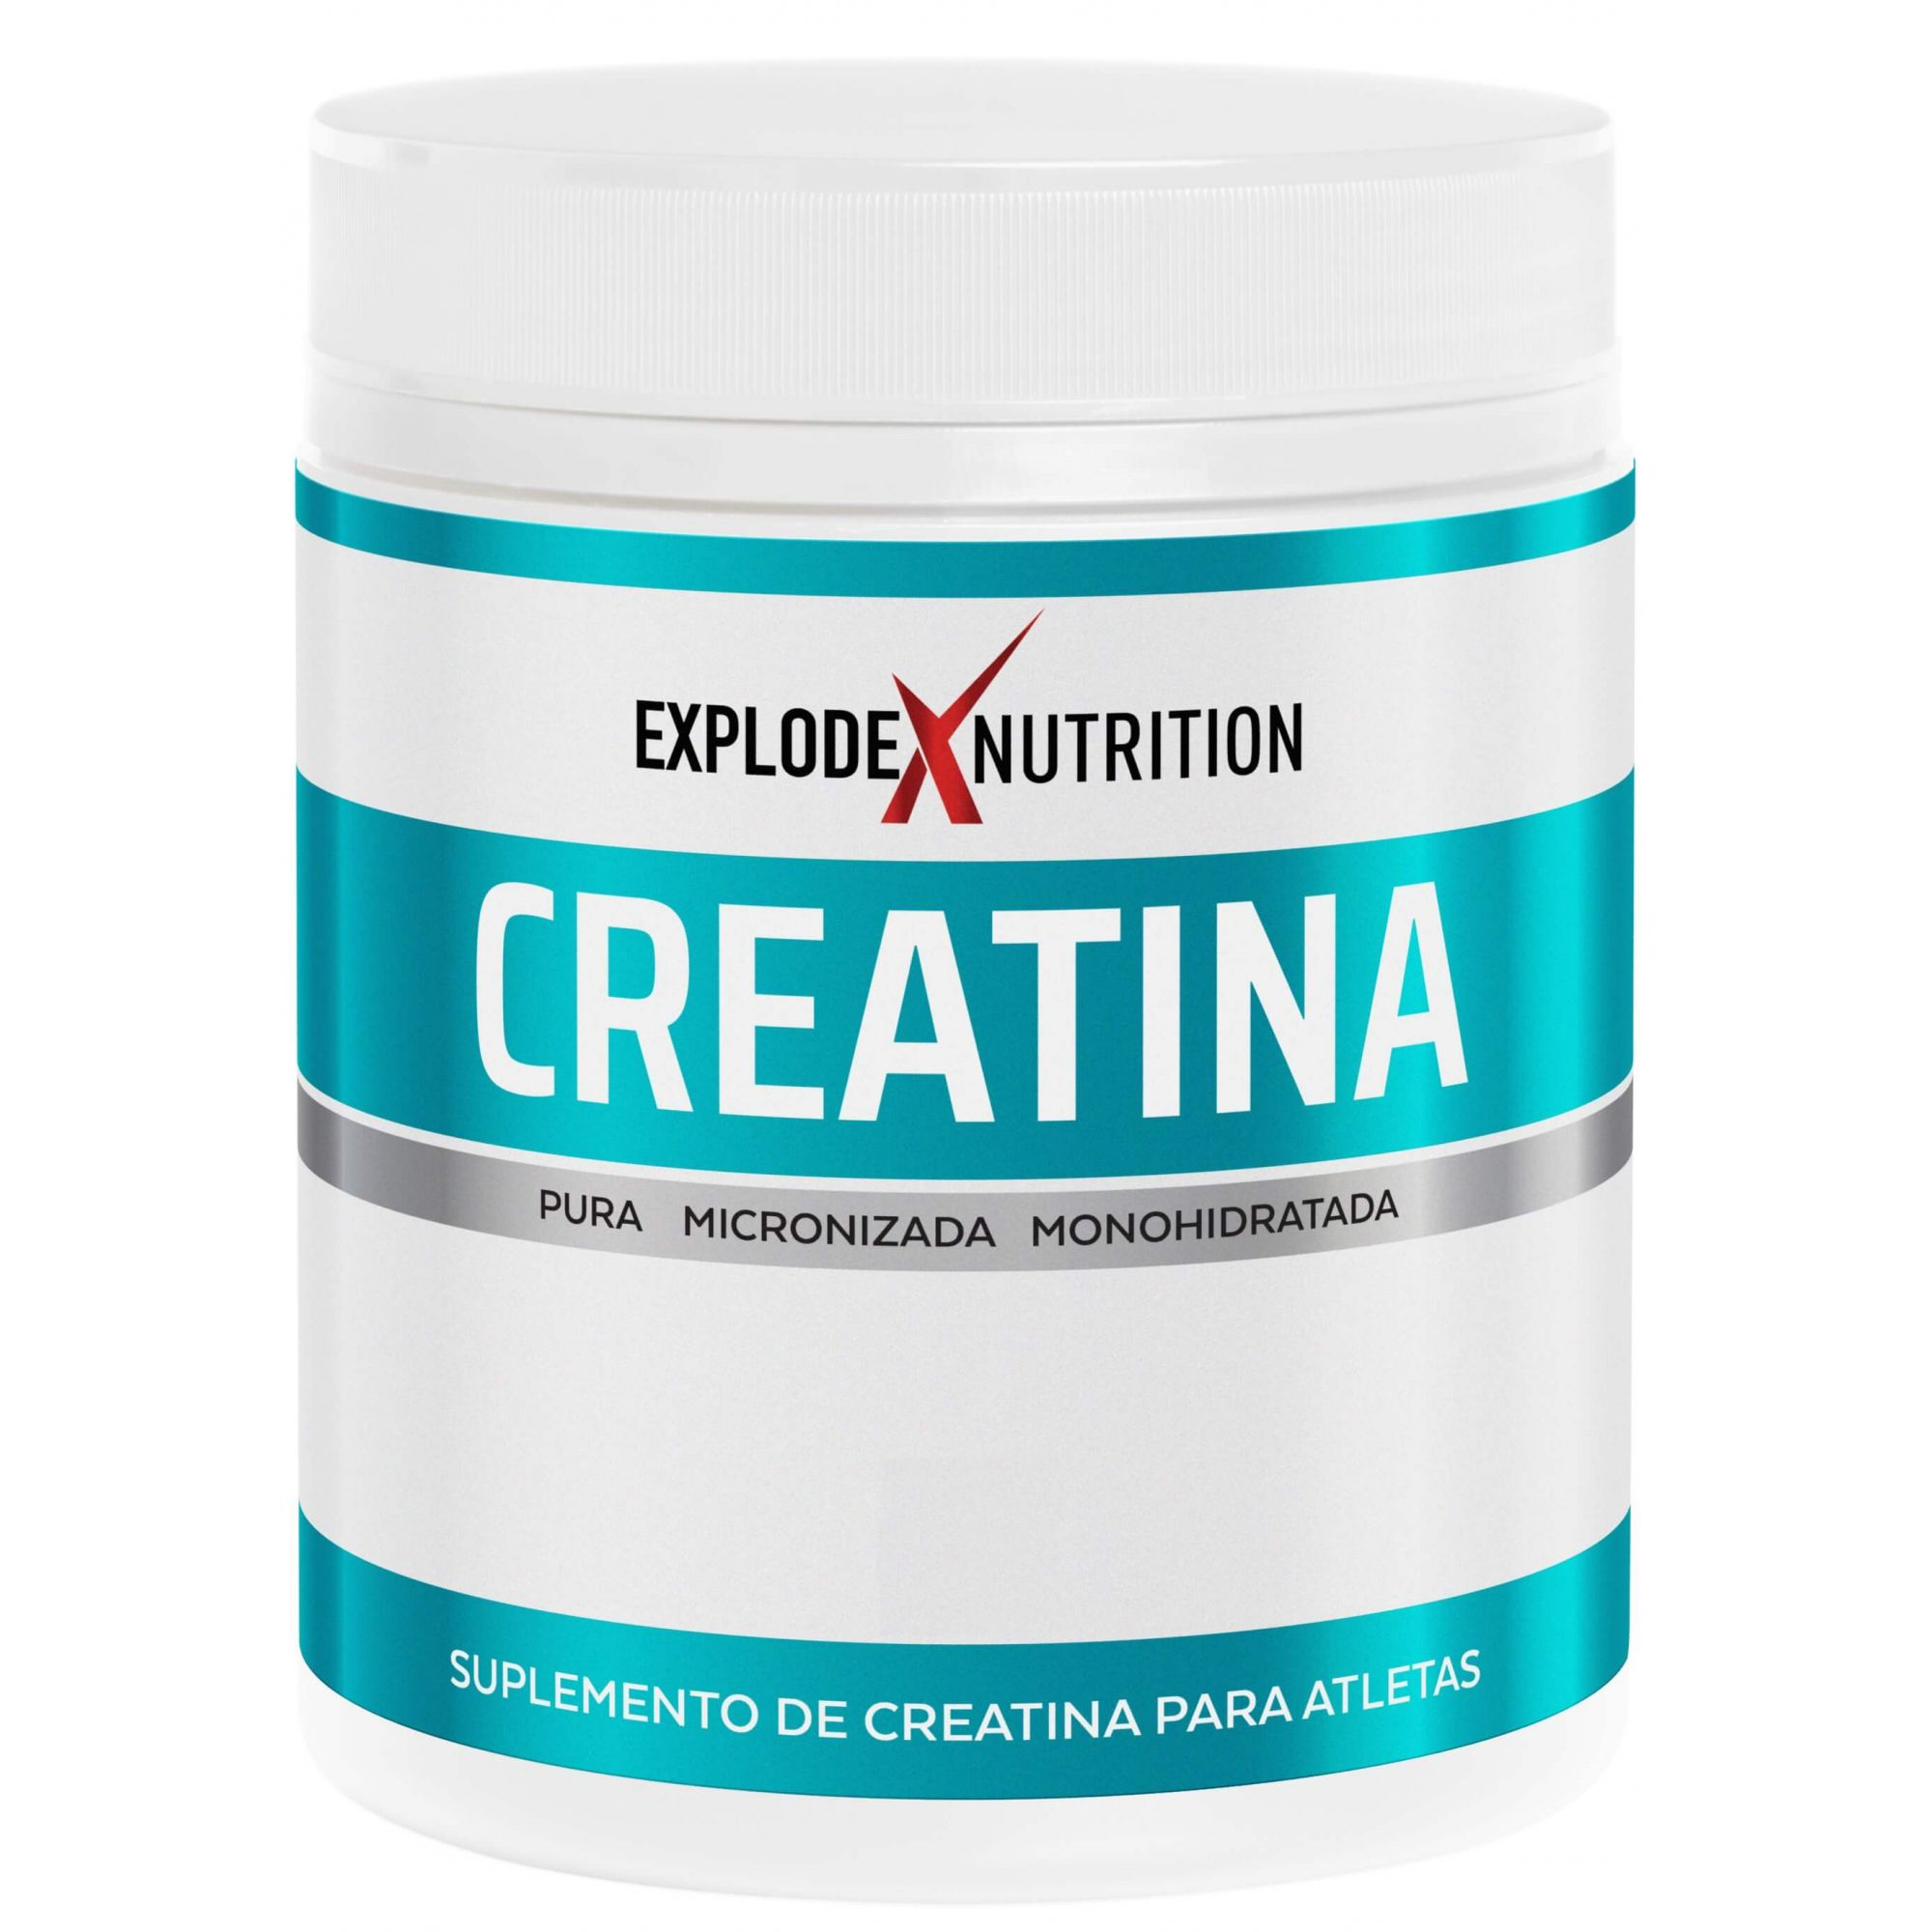 Creatina Explode Nutrition - 100g